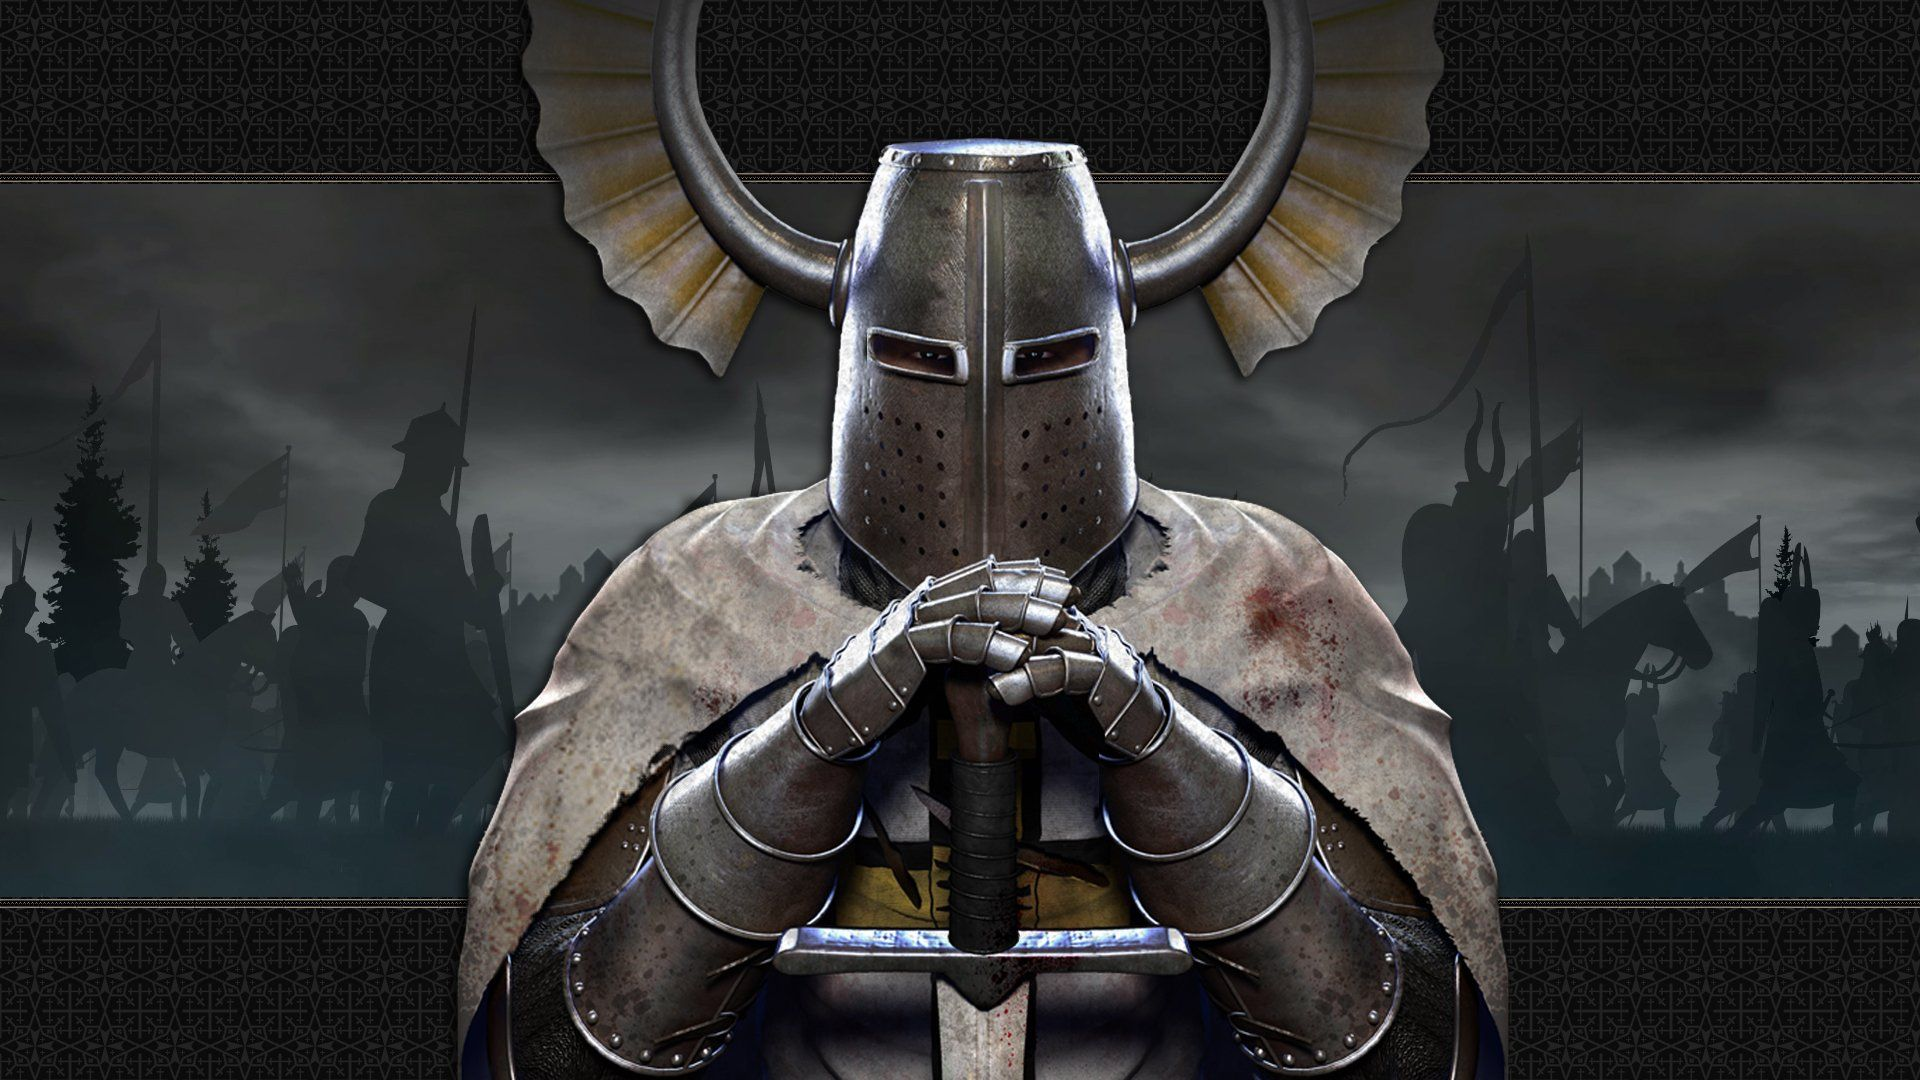 Medieval 2 Total War Wallpapers - Top Free Medieval 2 Total War